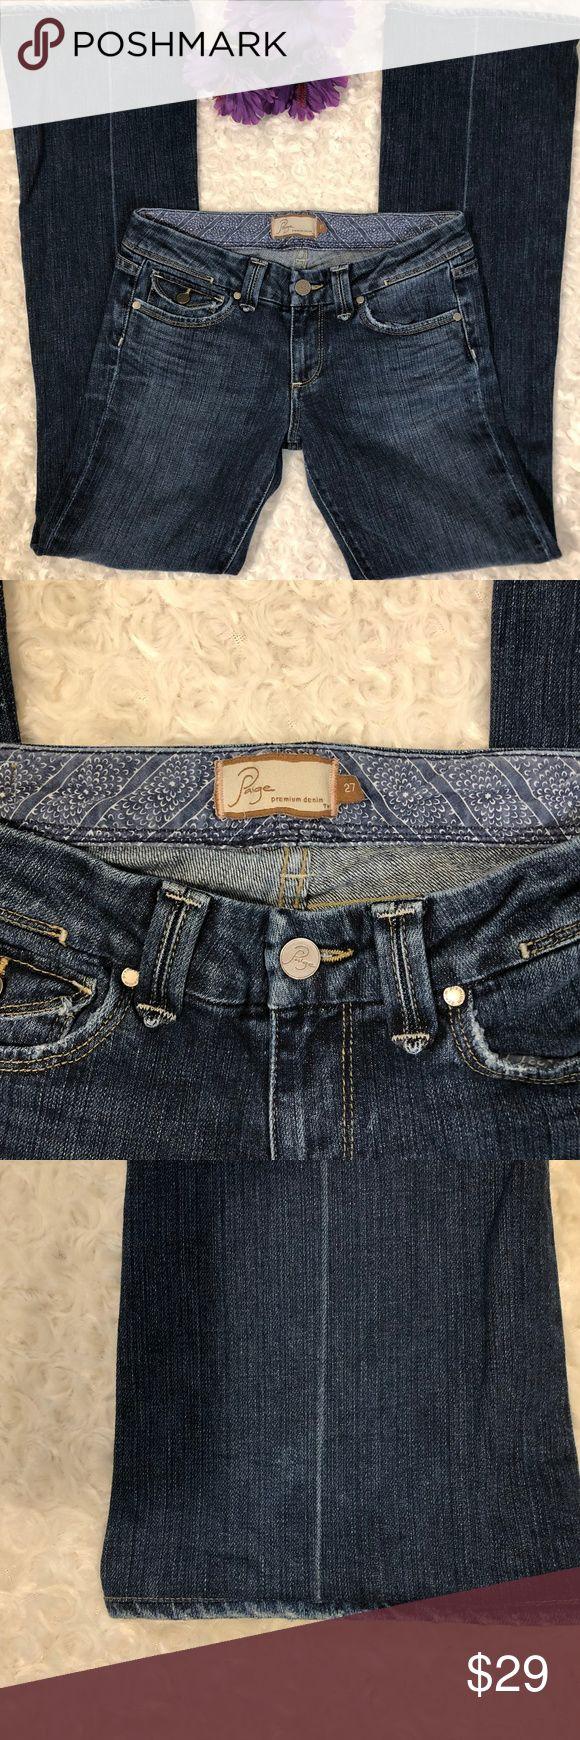 "Paige Premium Denim, Pico, Size 27 Paige Premium Denim, Pico, Size 27 Paige Premium denim jeans, Pico cut, distressed style slight wear to the bottom. Excellent Condition.  Approximate Measurements- Length-39"" Inseam-31"" Material- 98% Cotton/2% Lycra  BS-P-19 Paige Jeans Jeans Flare & Wide Leg"